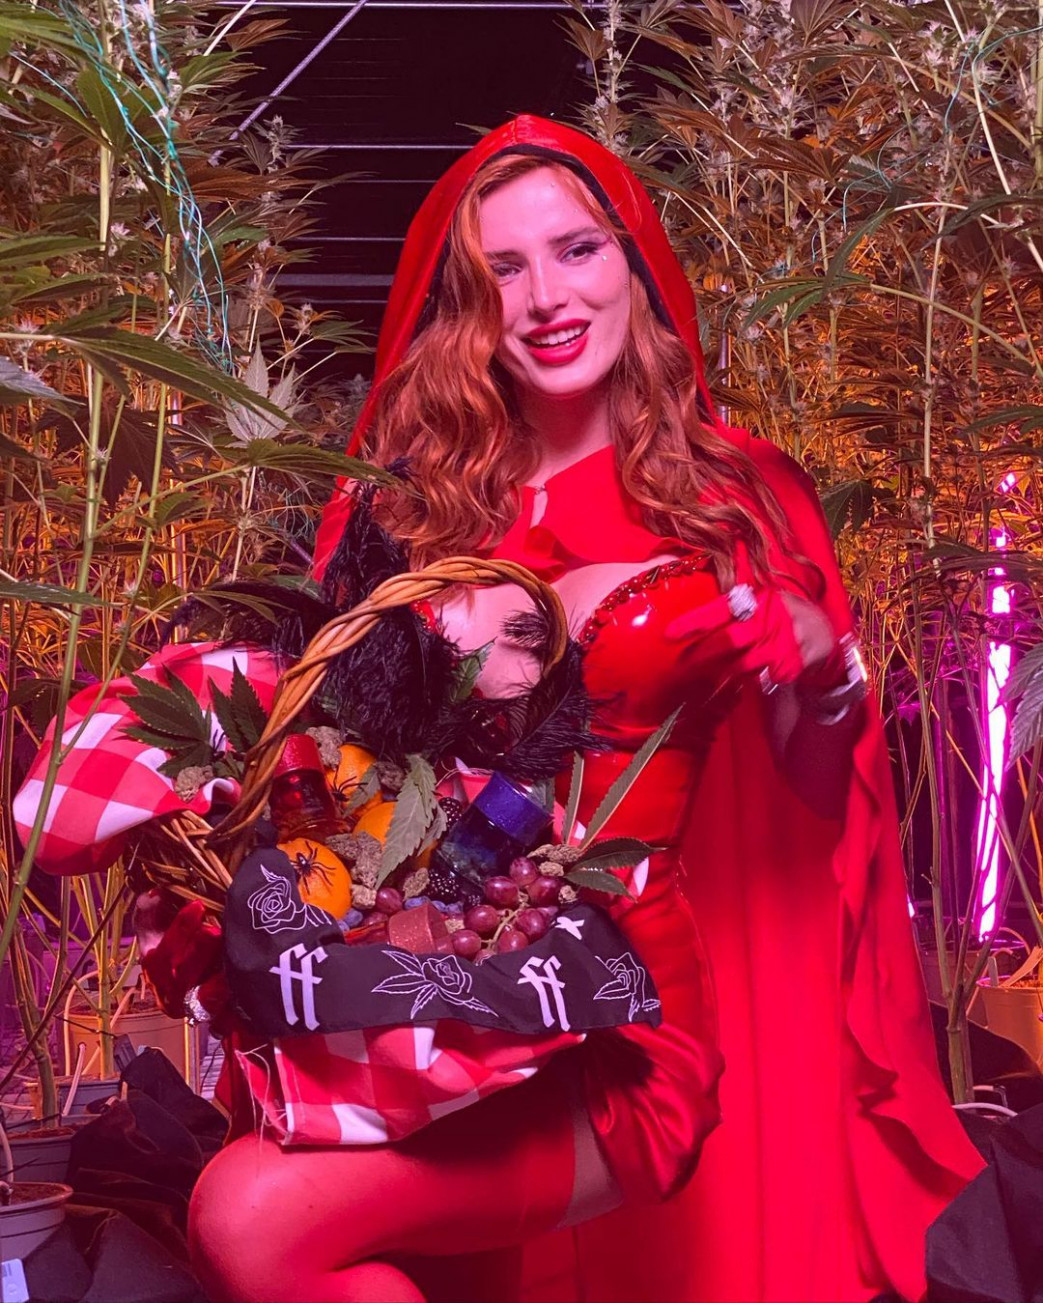 Bella-Thorne-In-Busty-Halloween-Costume-3.jpg